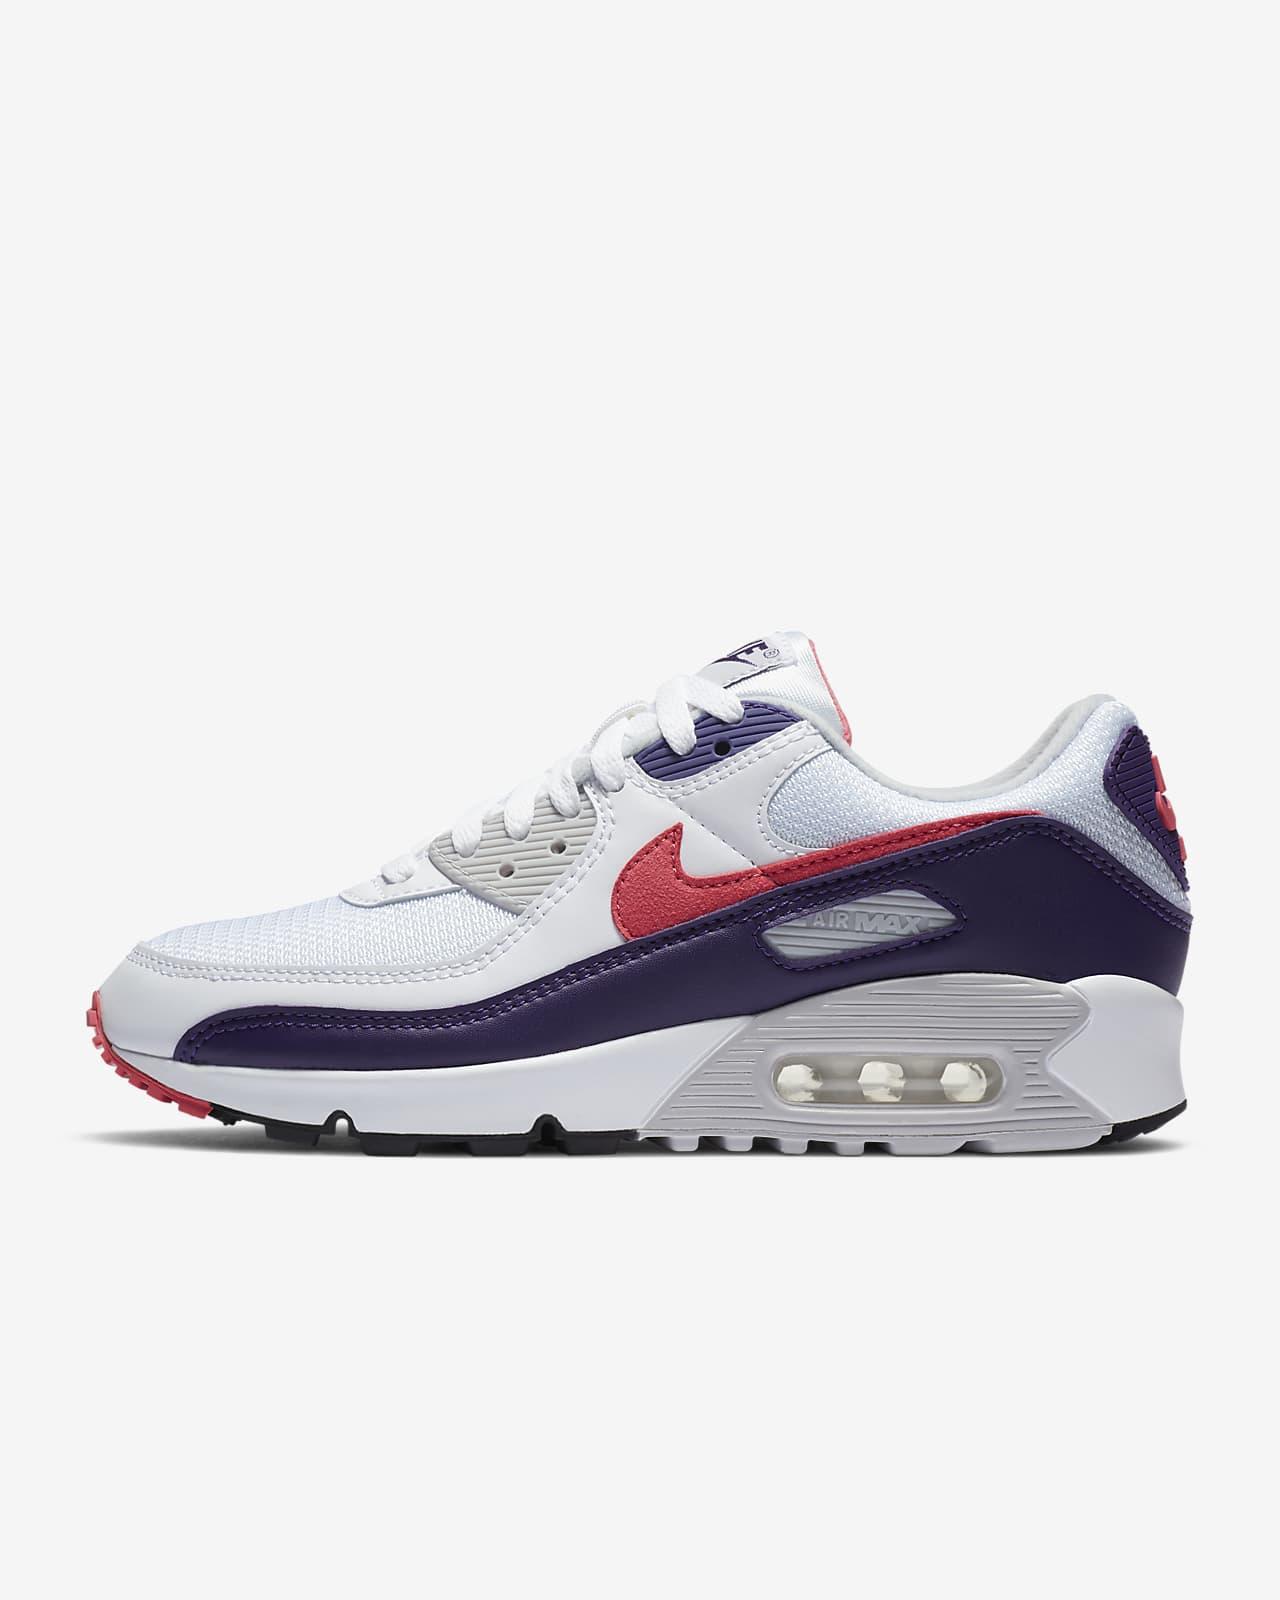 Nike Air Max III Shoe